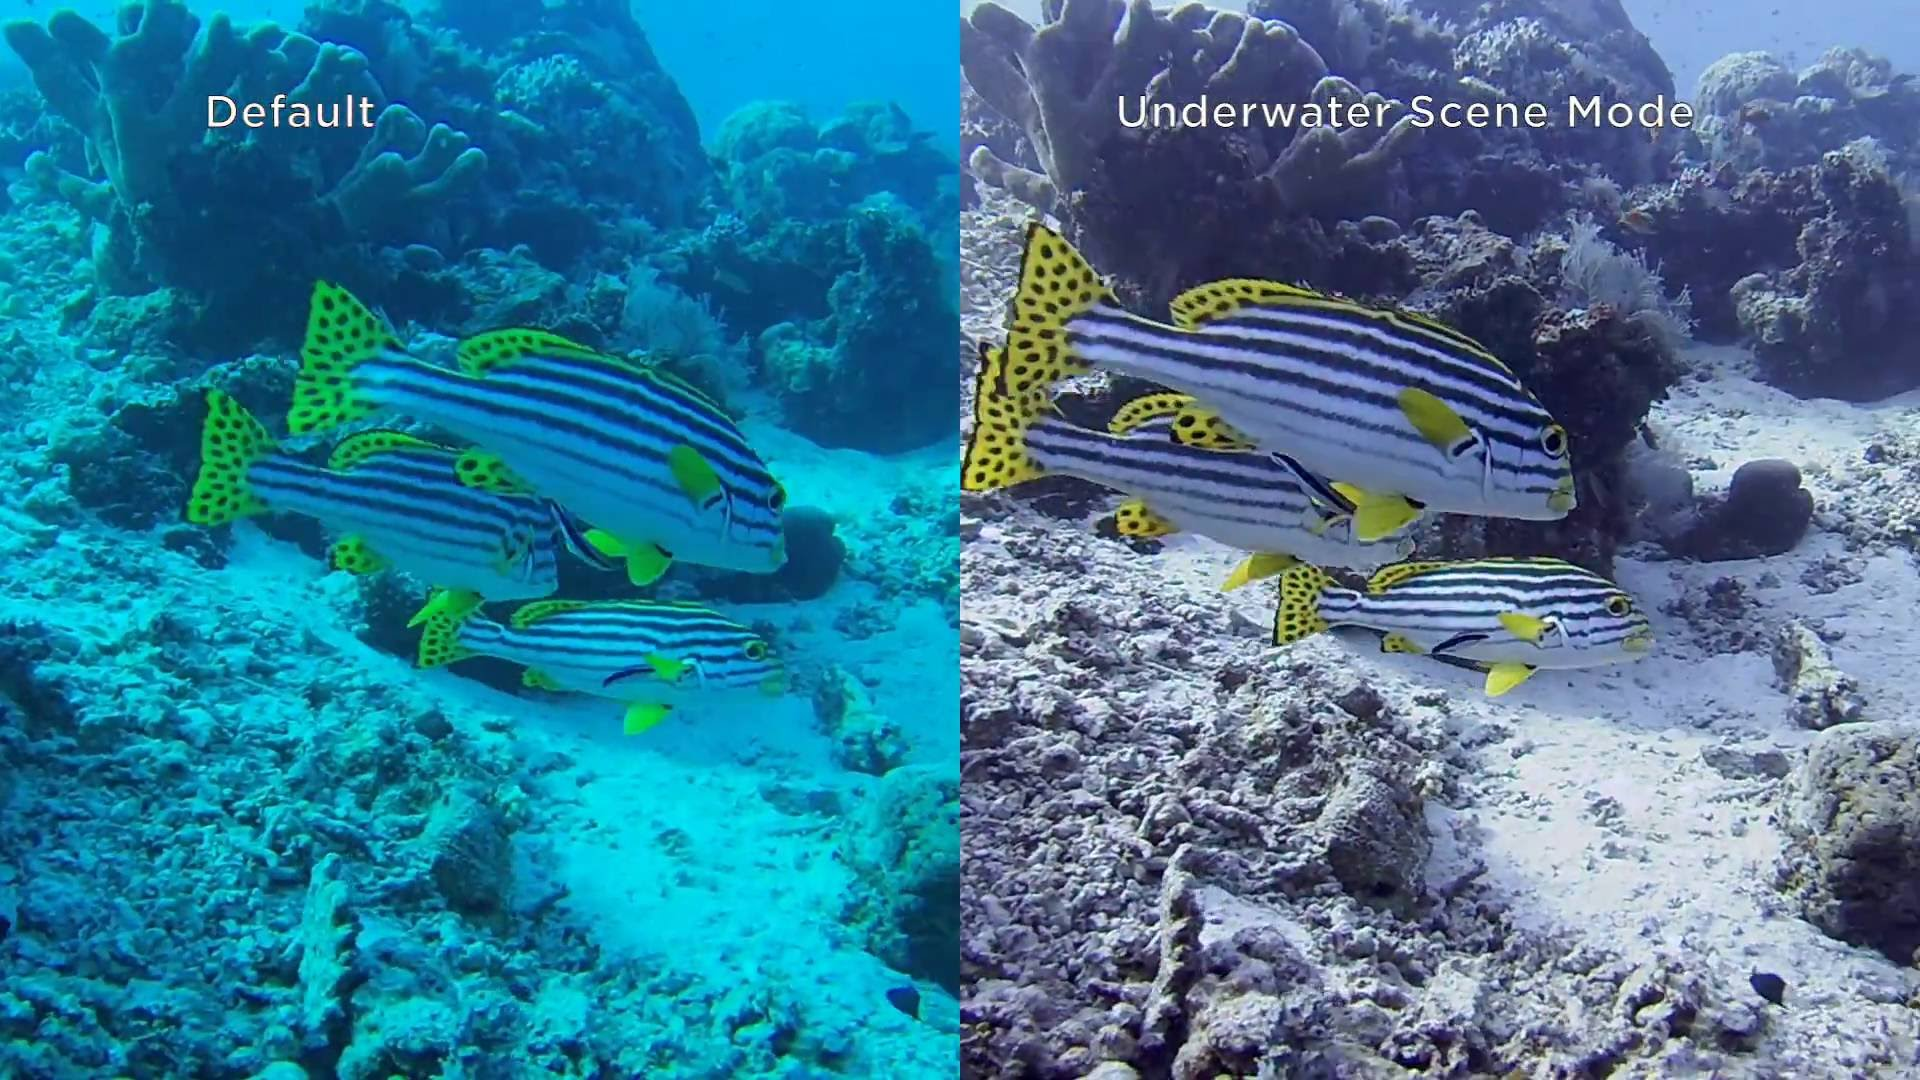 Underwater Scene Mode